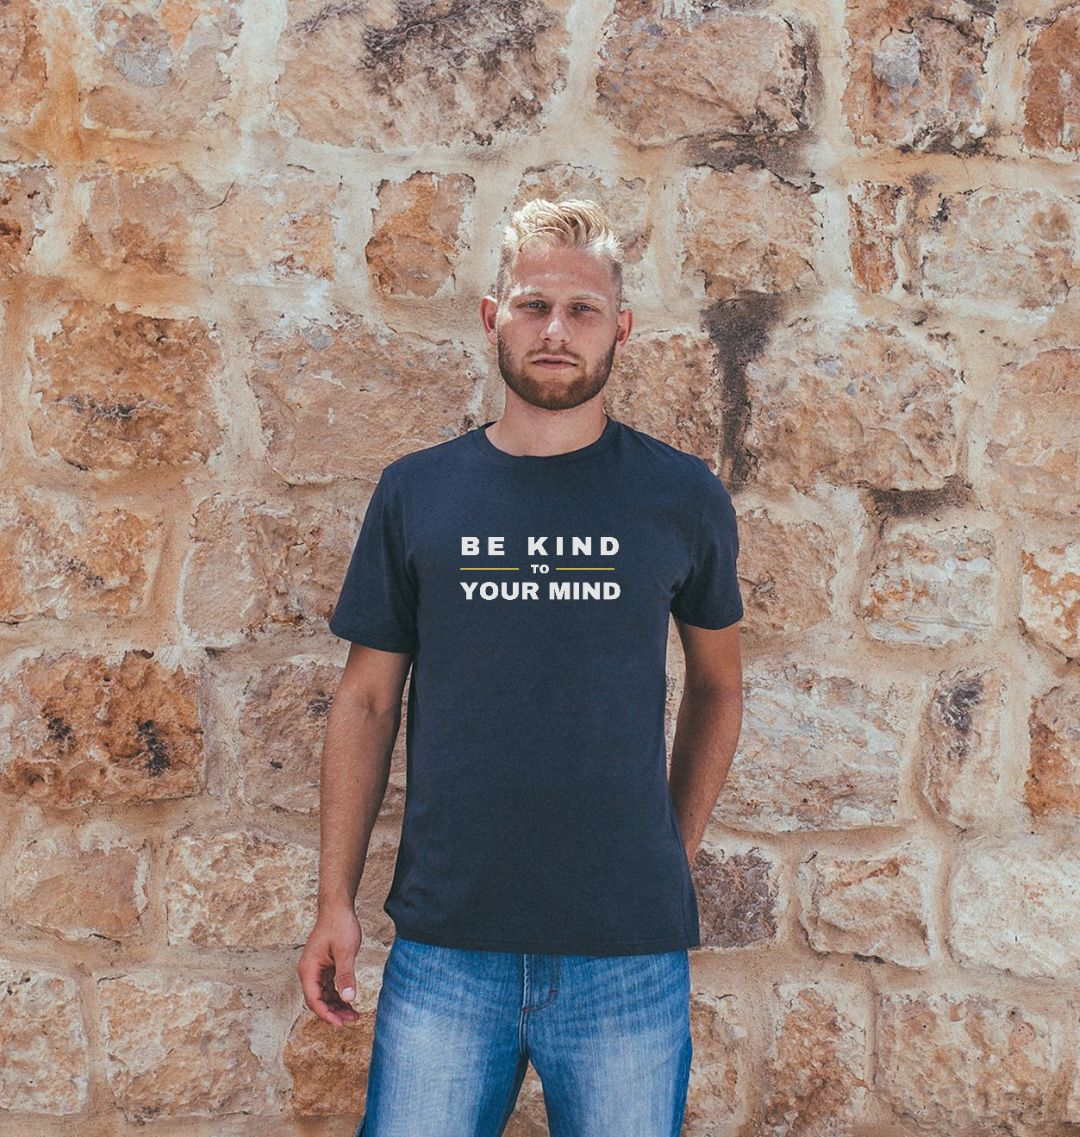 BE KIND TO YOUR MIND Mens Mental Health T-shirt Top – Organic Cotton, Vegan Kind Shop 4